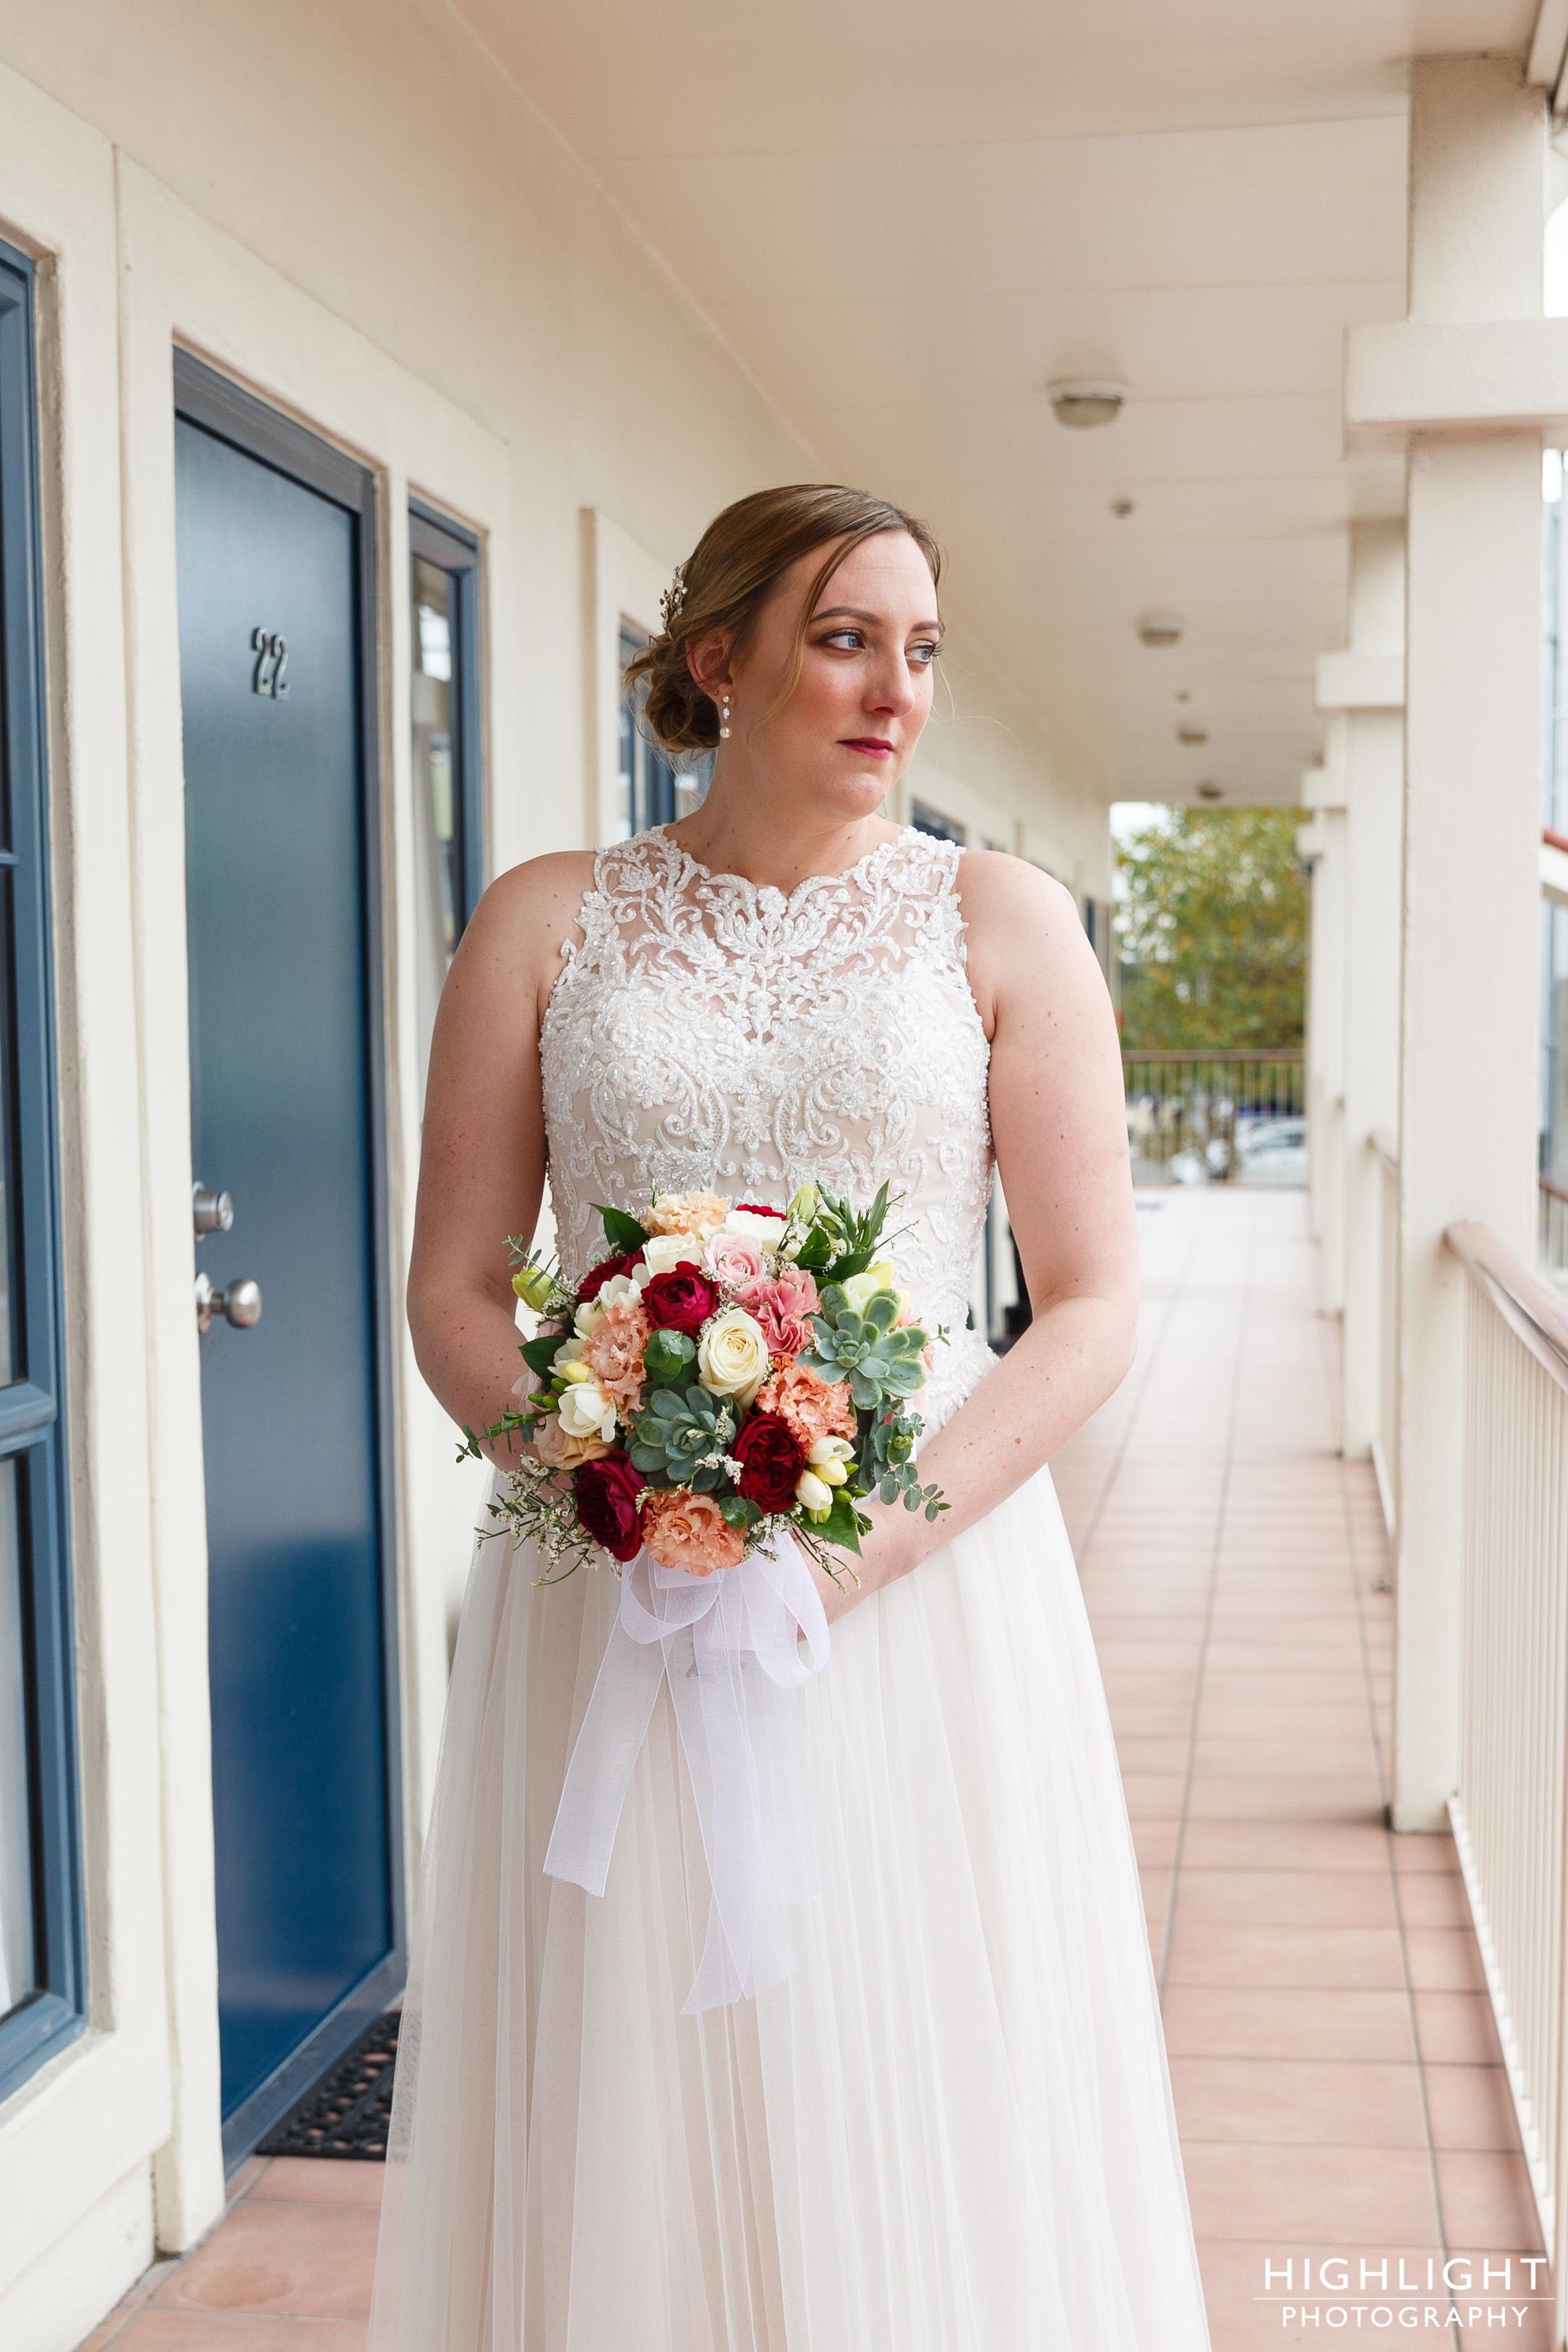 highlight-wedding-photography-palmerston-north-new-zealand-manawatu-chalet-23.jpg